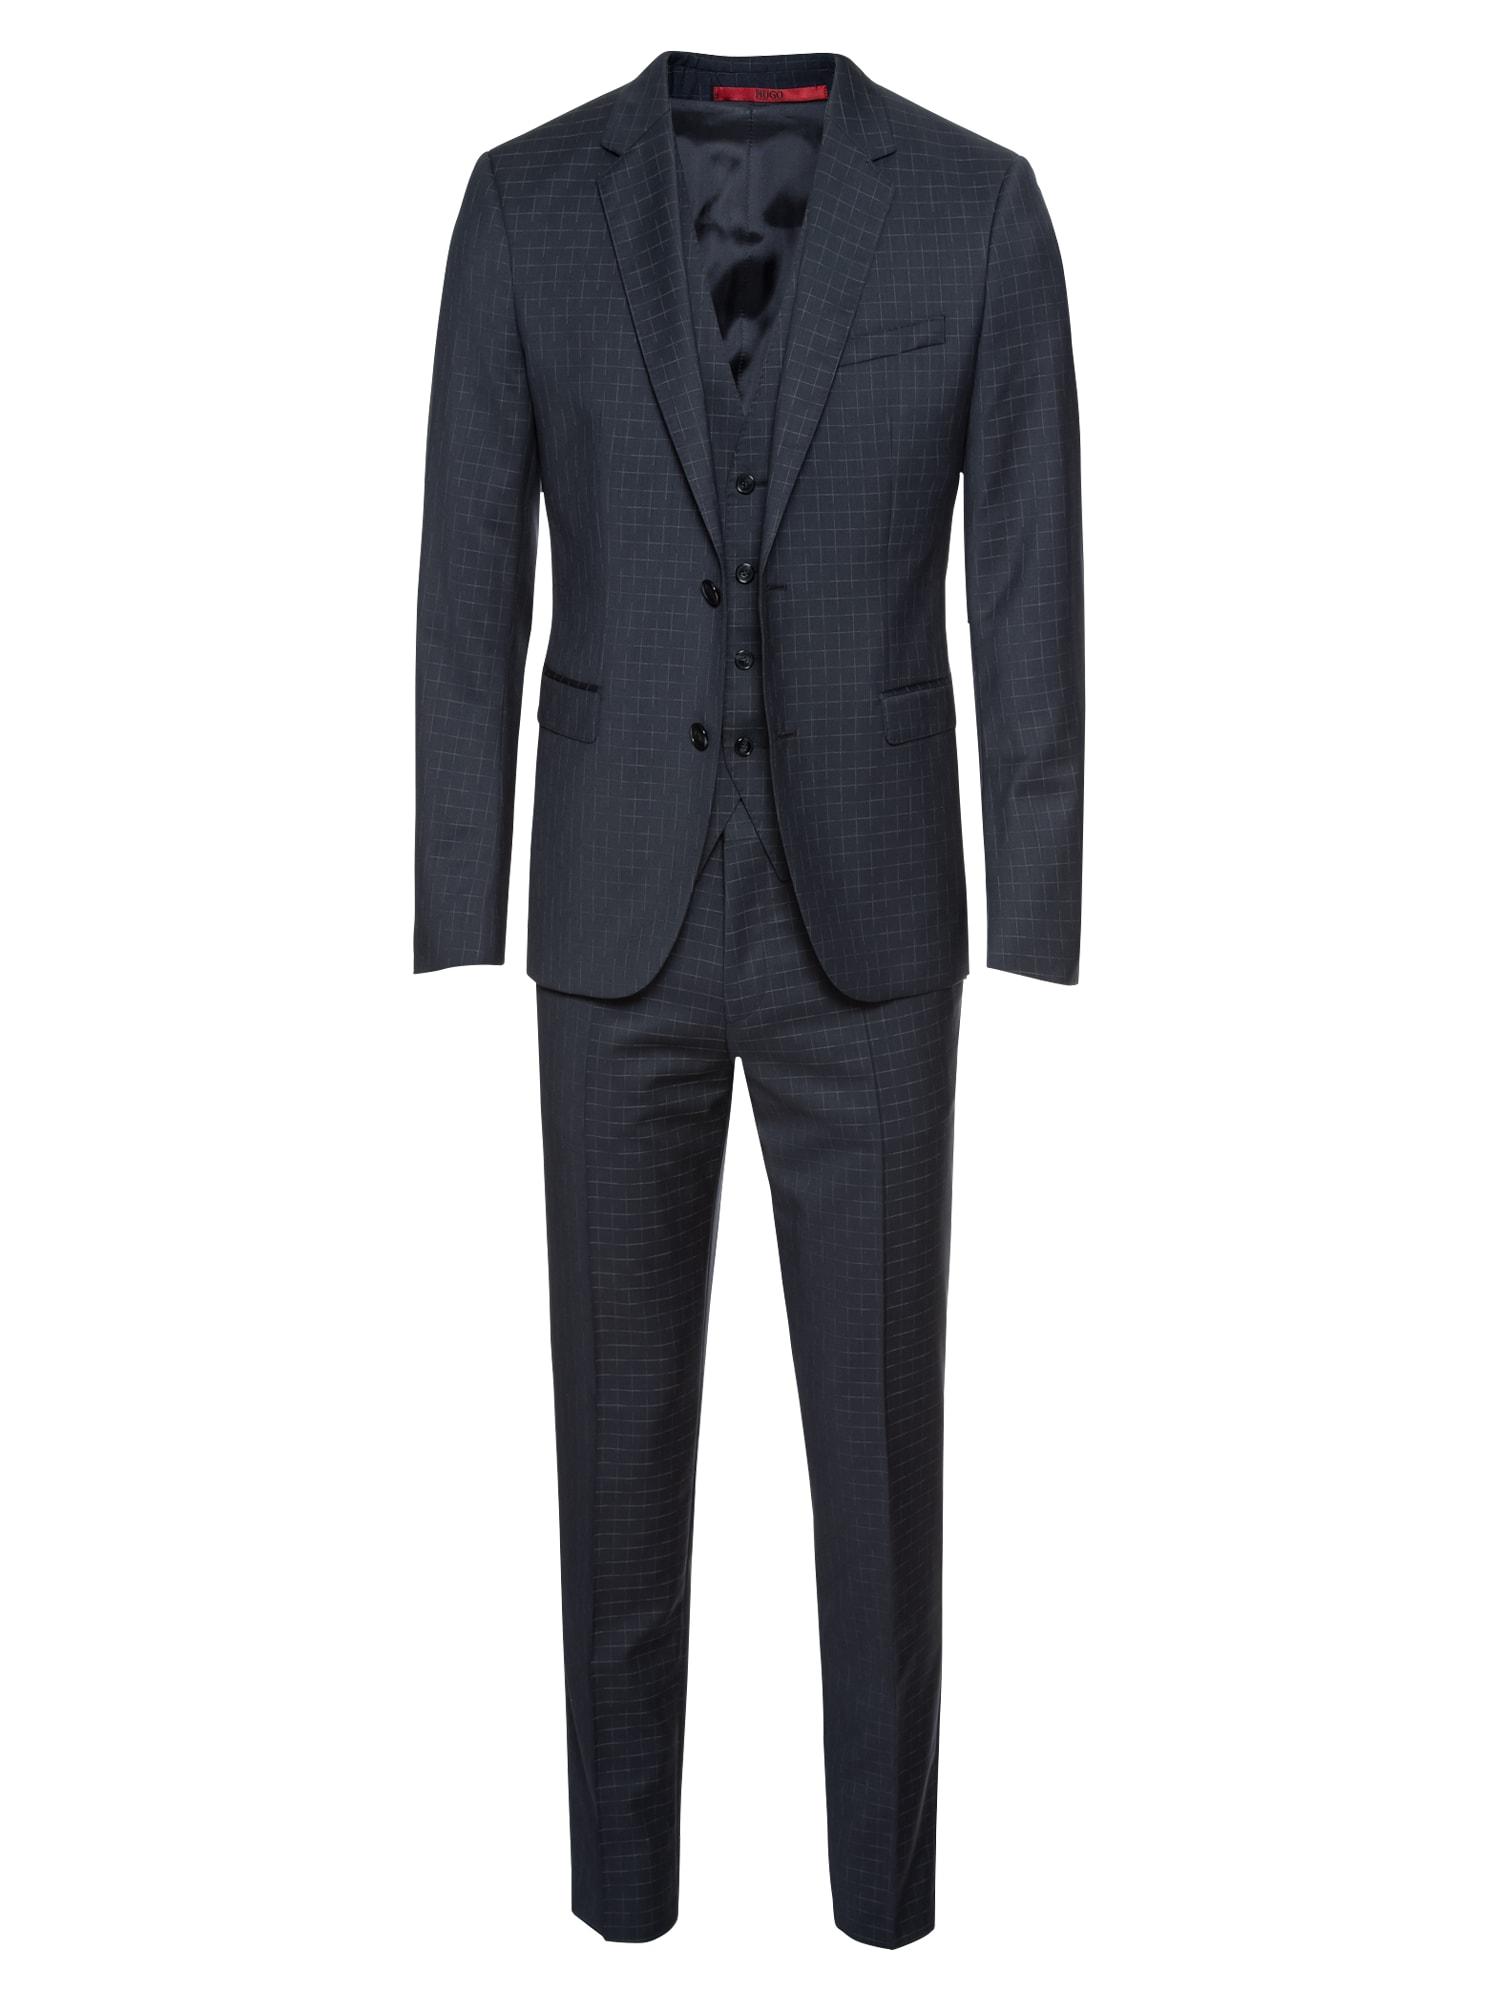 Oblek AstianHets182V1 10207418 0 námořnická modř HUGO